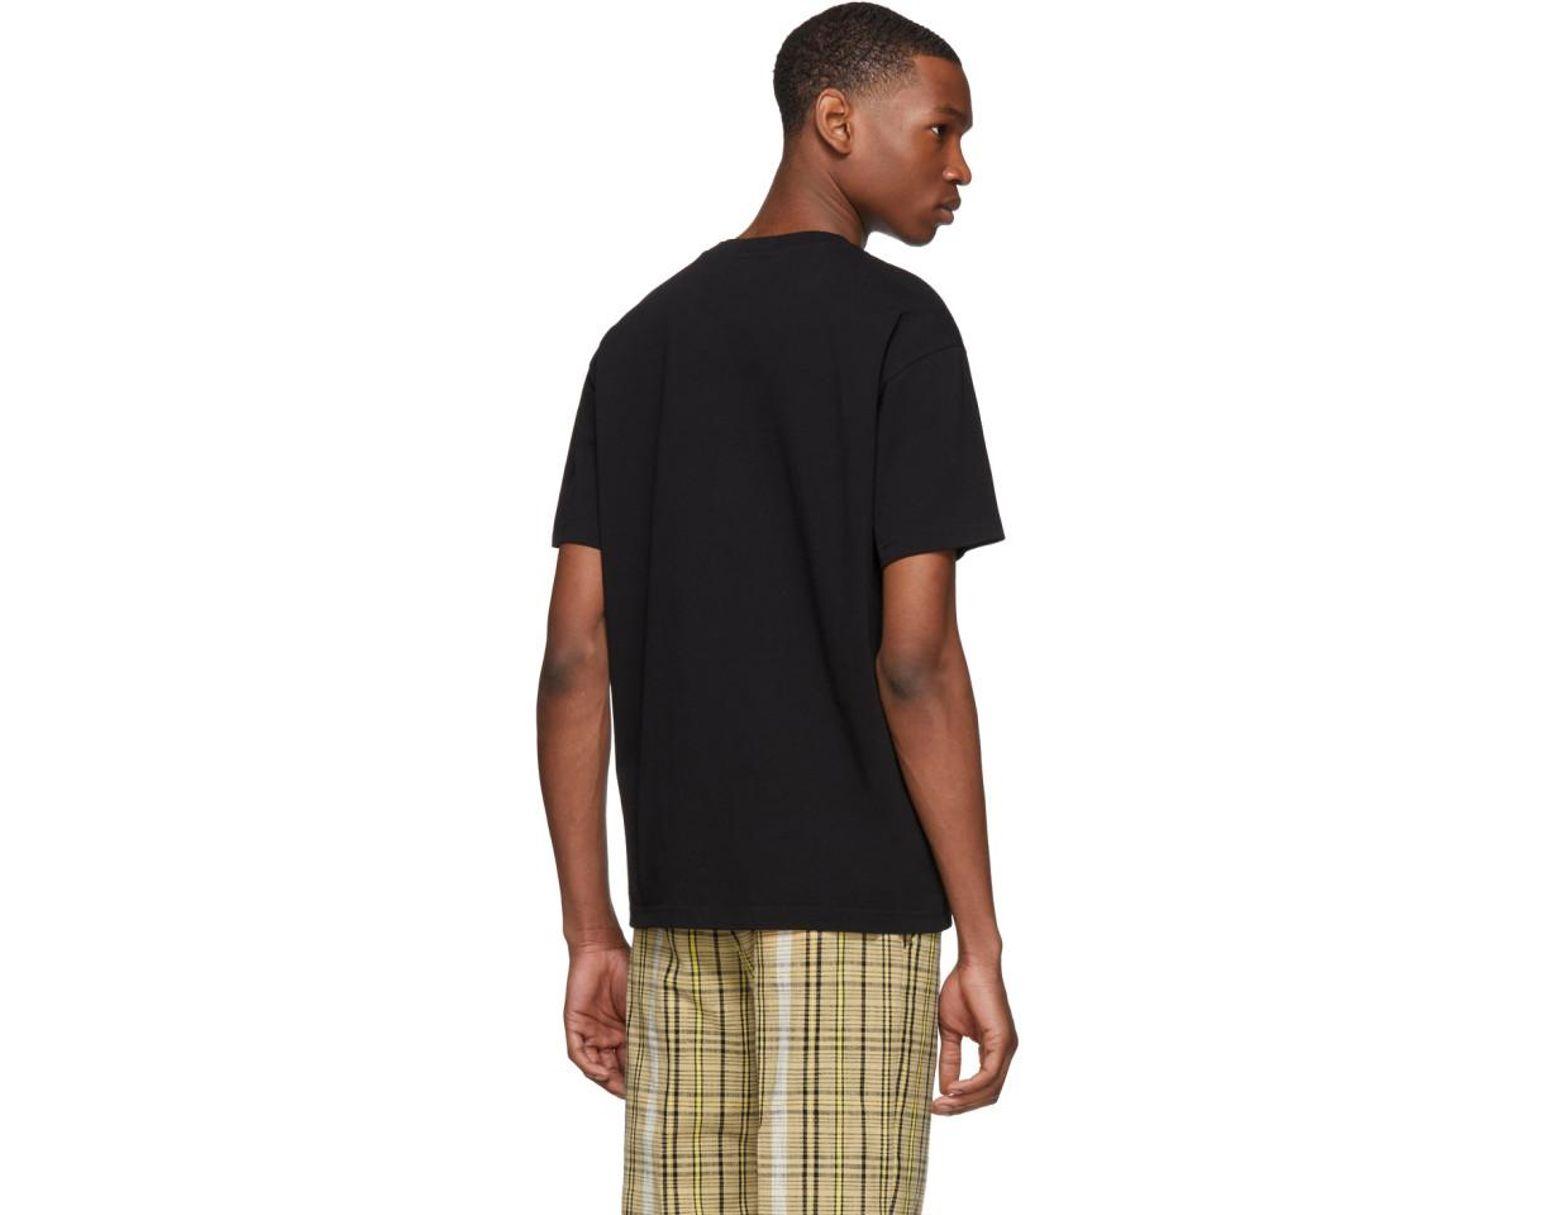 b97f1694 KENZO Black Neon Tiger T-shirt in Black for Men - Lyst